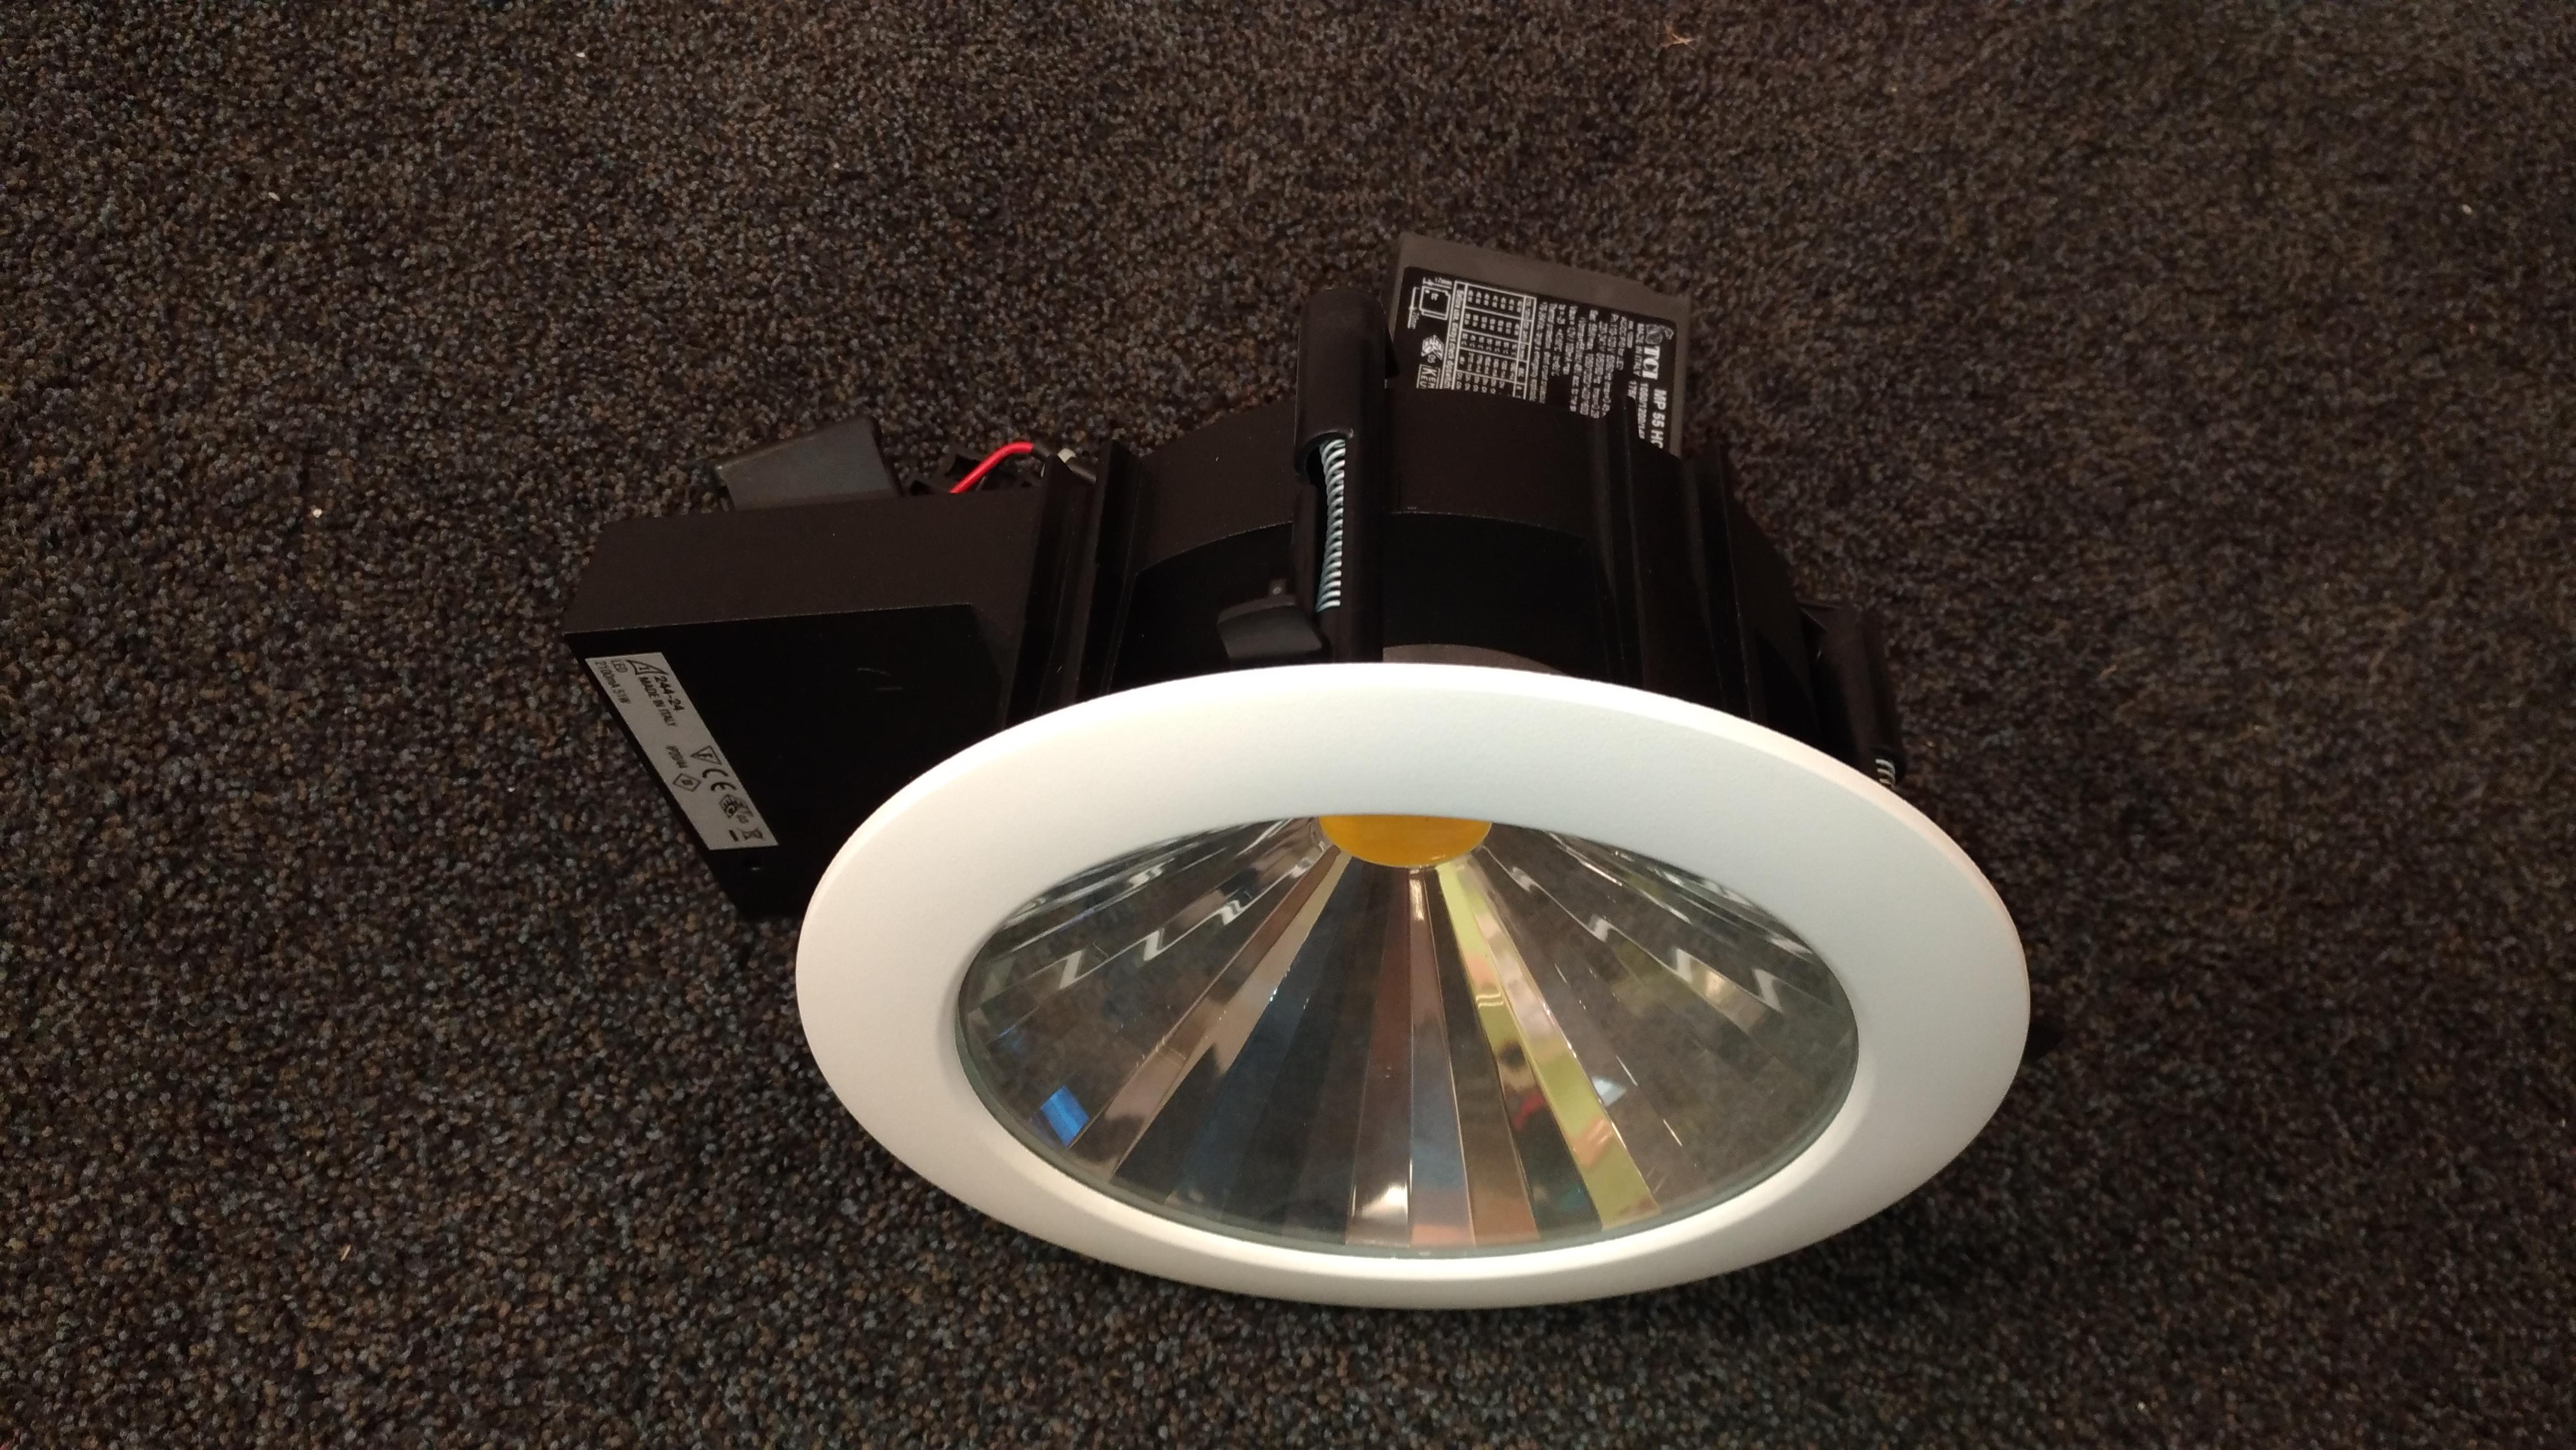 IVELA vana+RA20 DIXIT LED 4400LM 3000K ¤200 (ava 185mm) VALGE